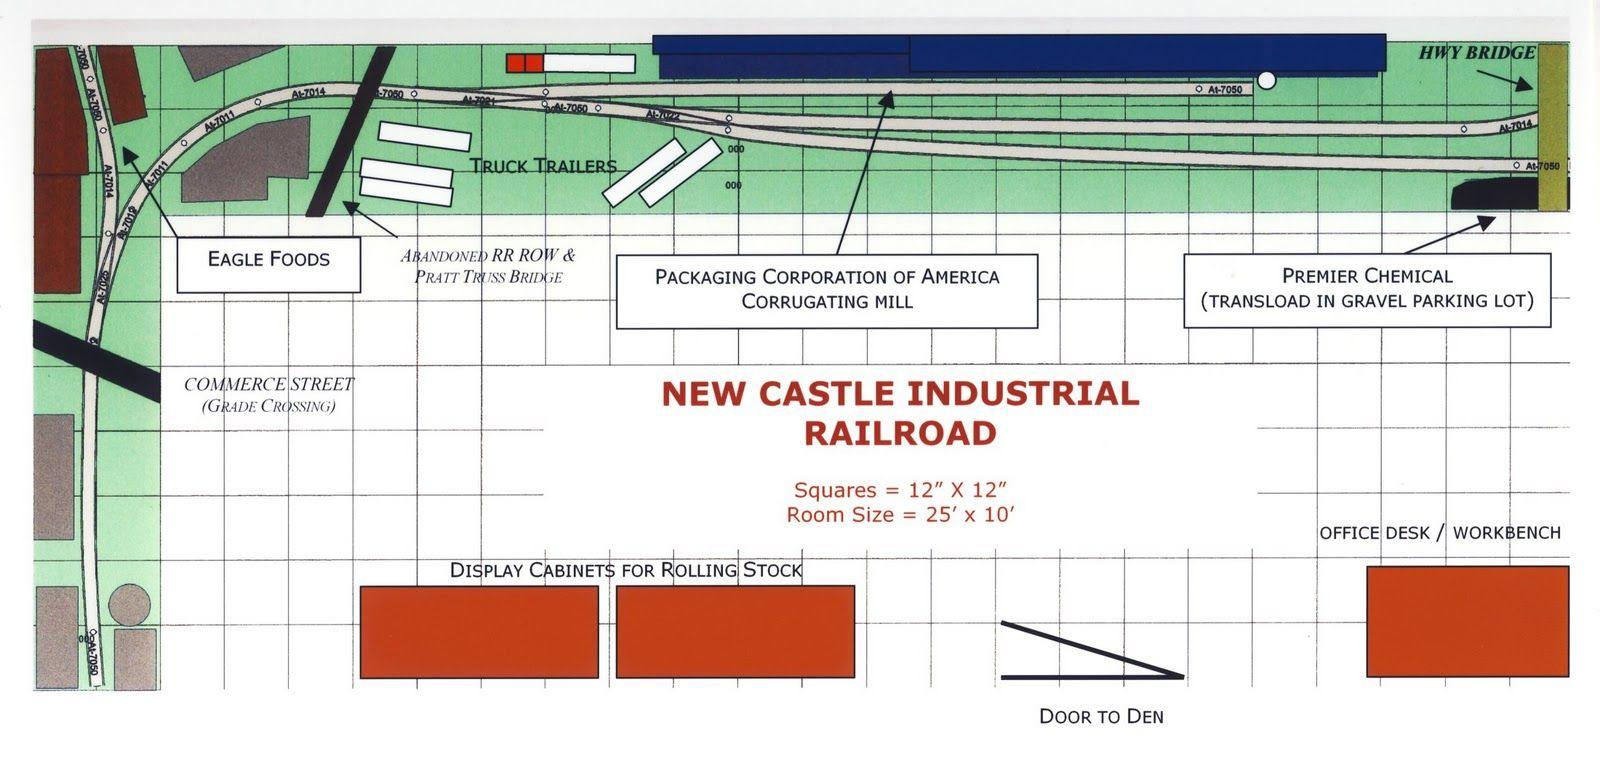 Wiring diagram together with ho model train layout plans moreover ho - Enoden Track Plan For N Gauge Model Railroad Pinterest Gauges And Scale Models